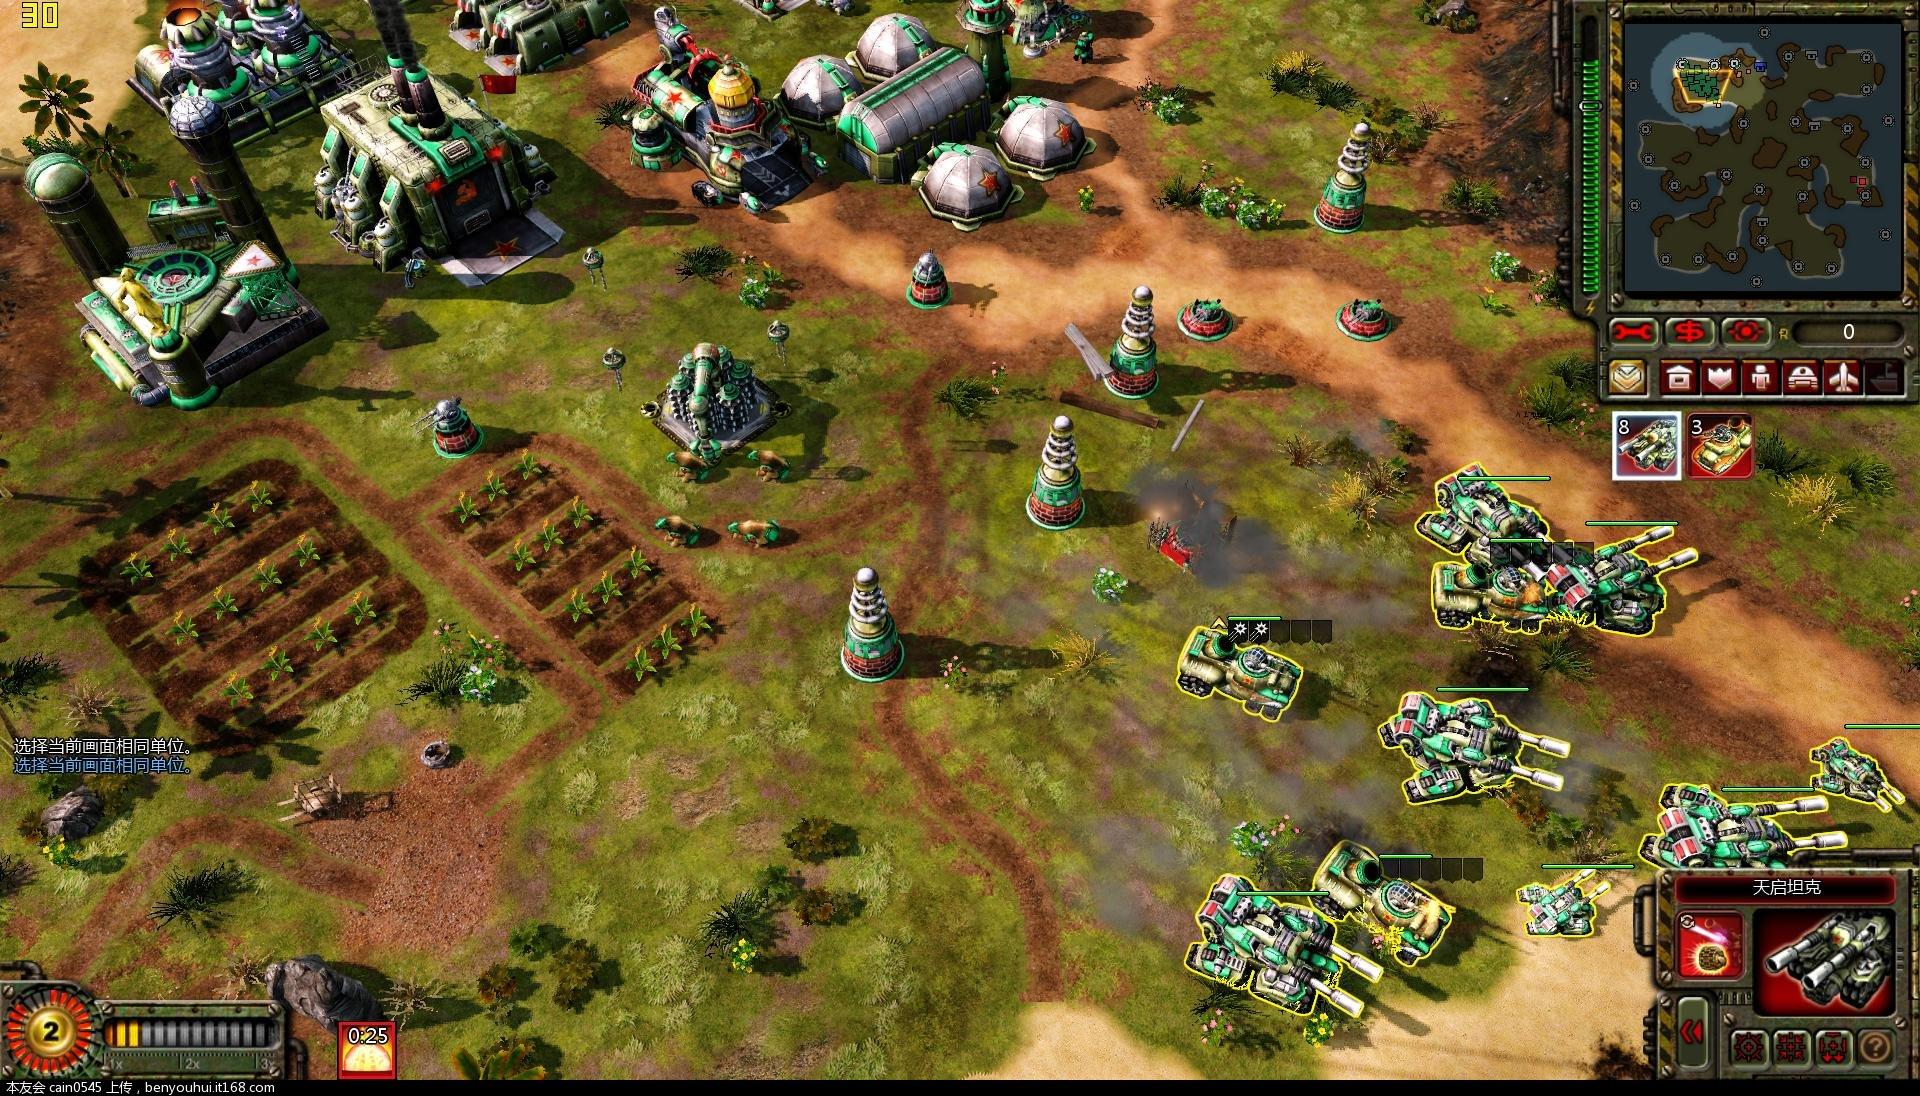 RA3_1 2012-10-08 06-18-51-78.jpg